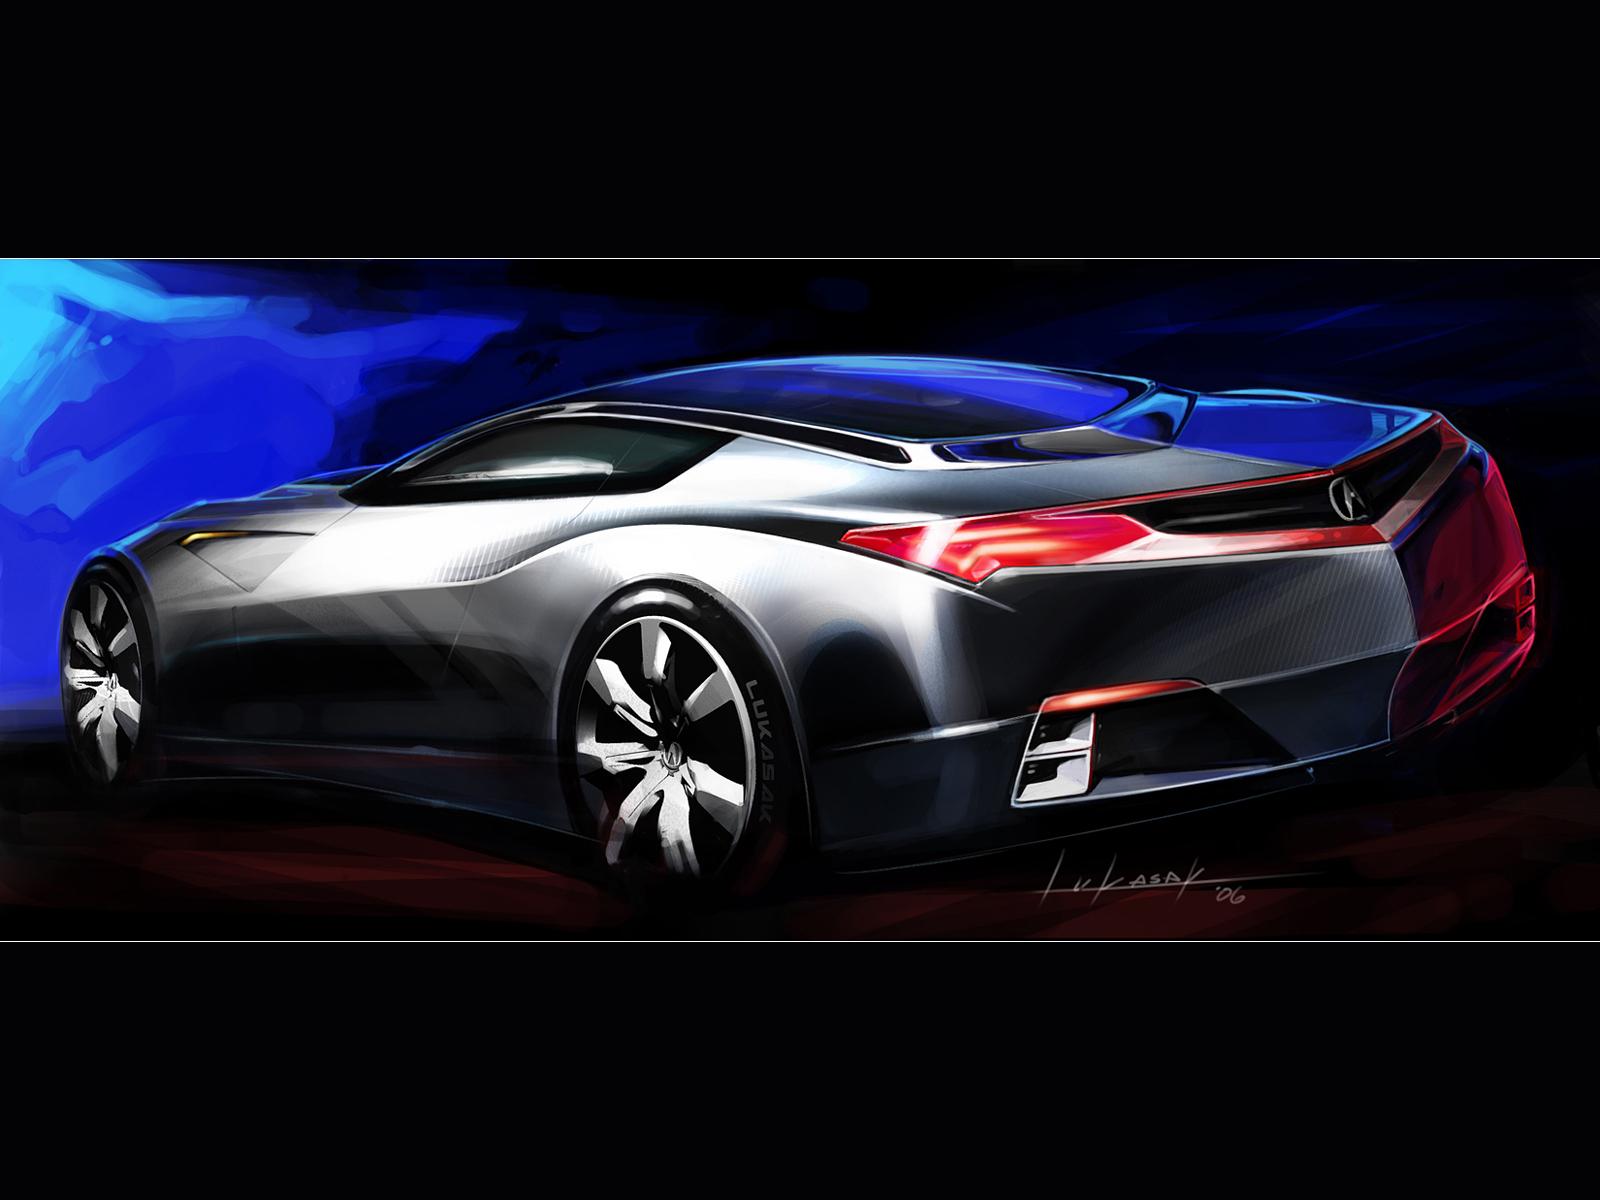 high resolution of cars for wallpaper : Tracksbrewpubbrampton.com